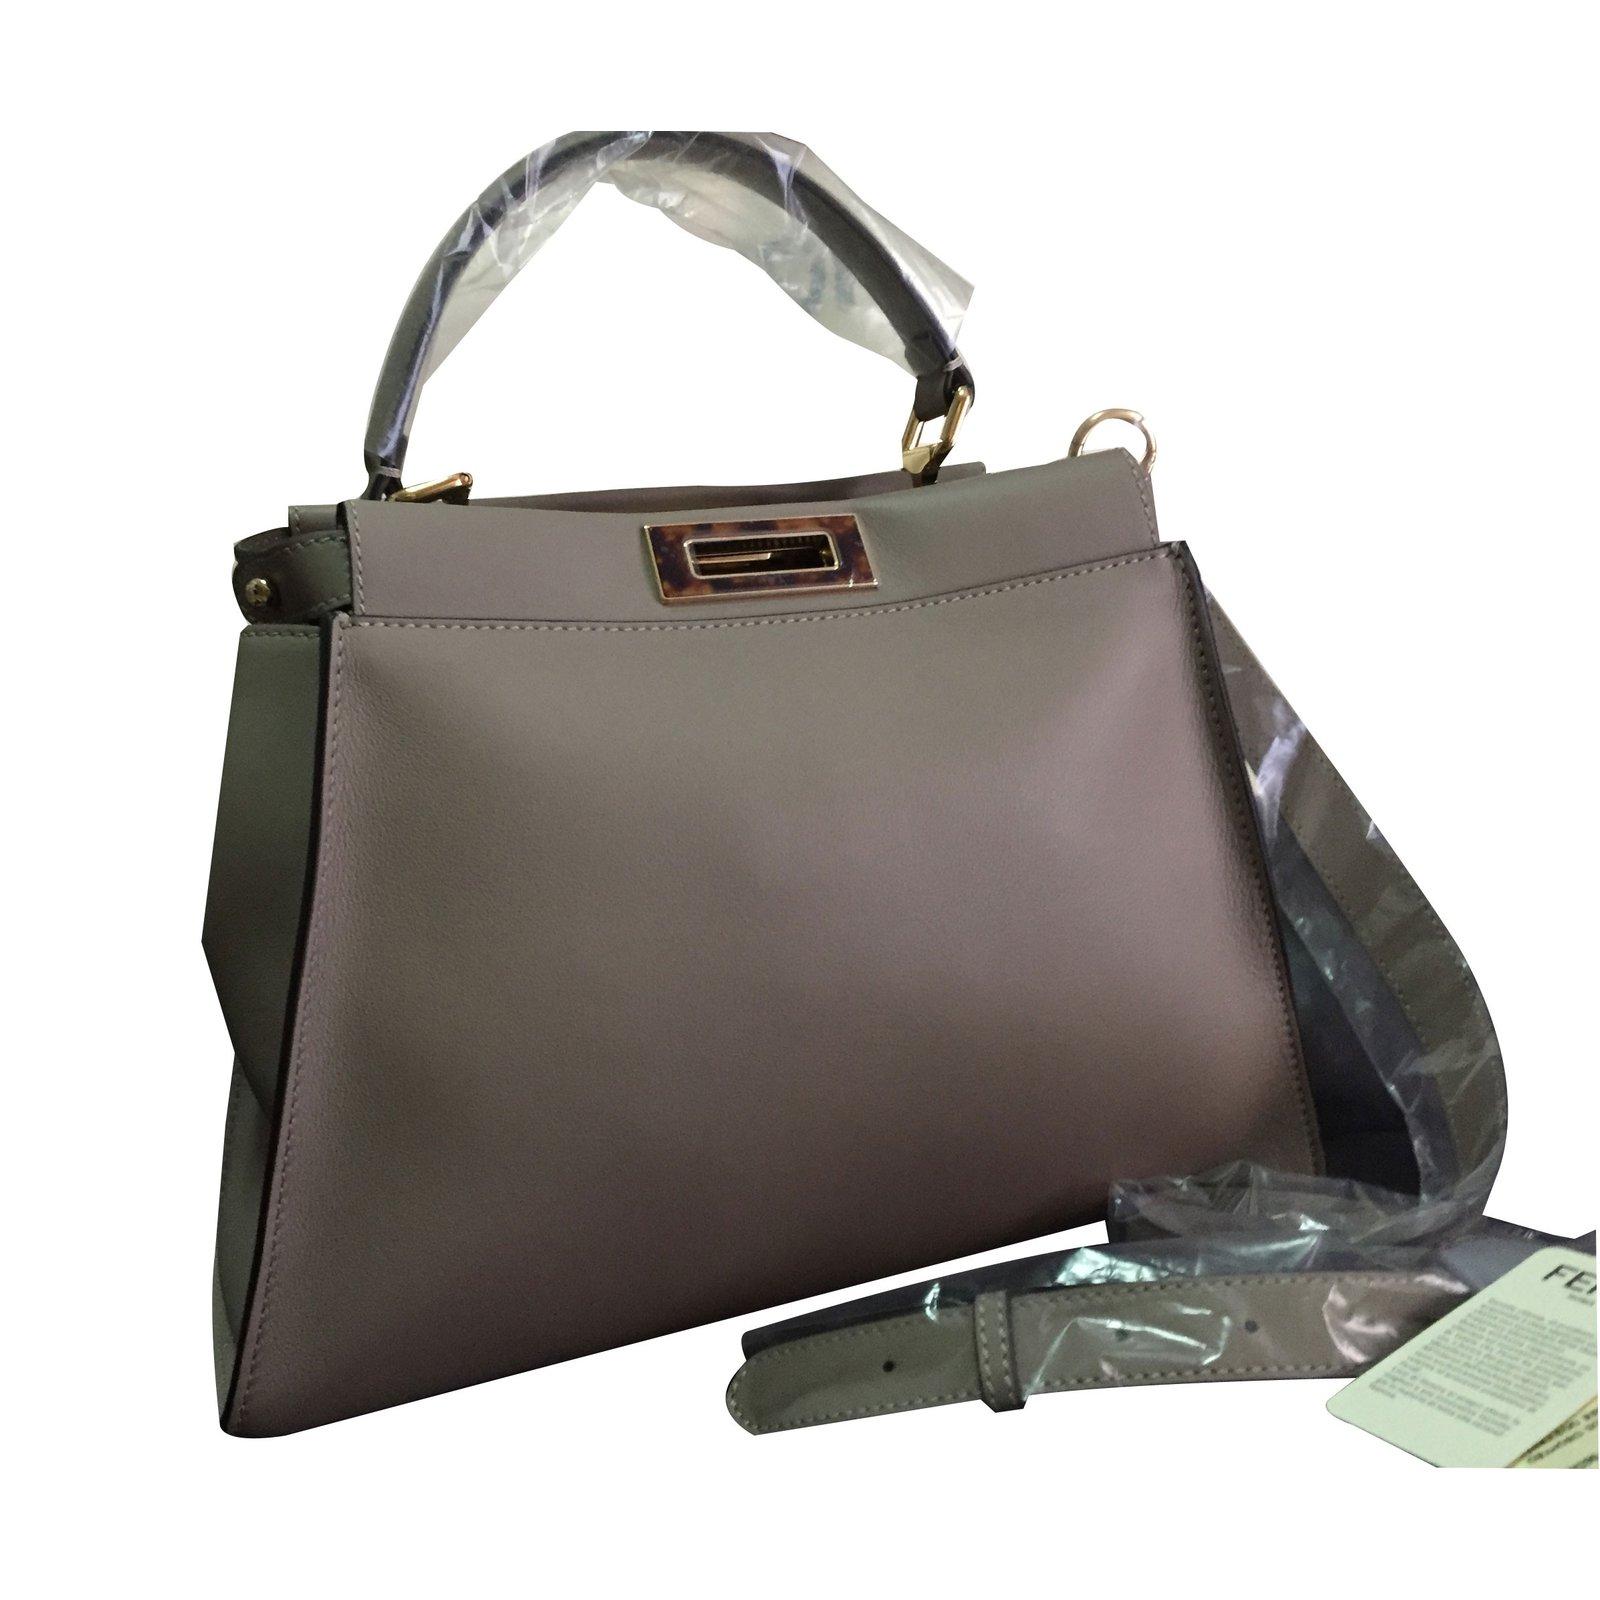 ee1337dcf2d9 Fendi Handbags Handbags Leather Grey ref.35270 - Joli Closet